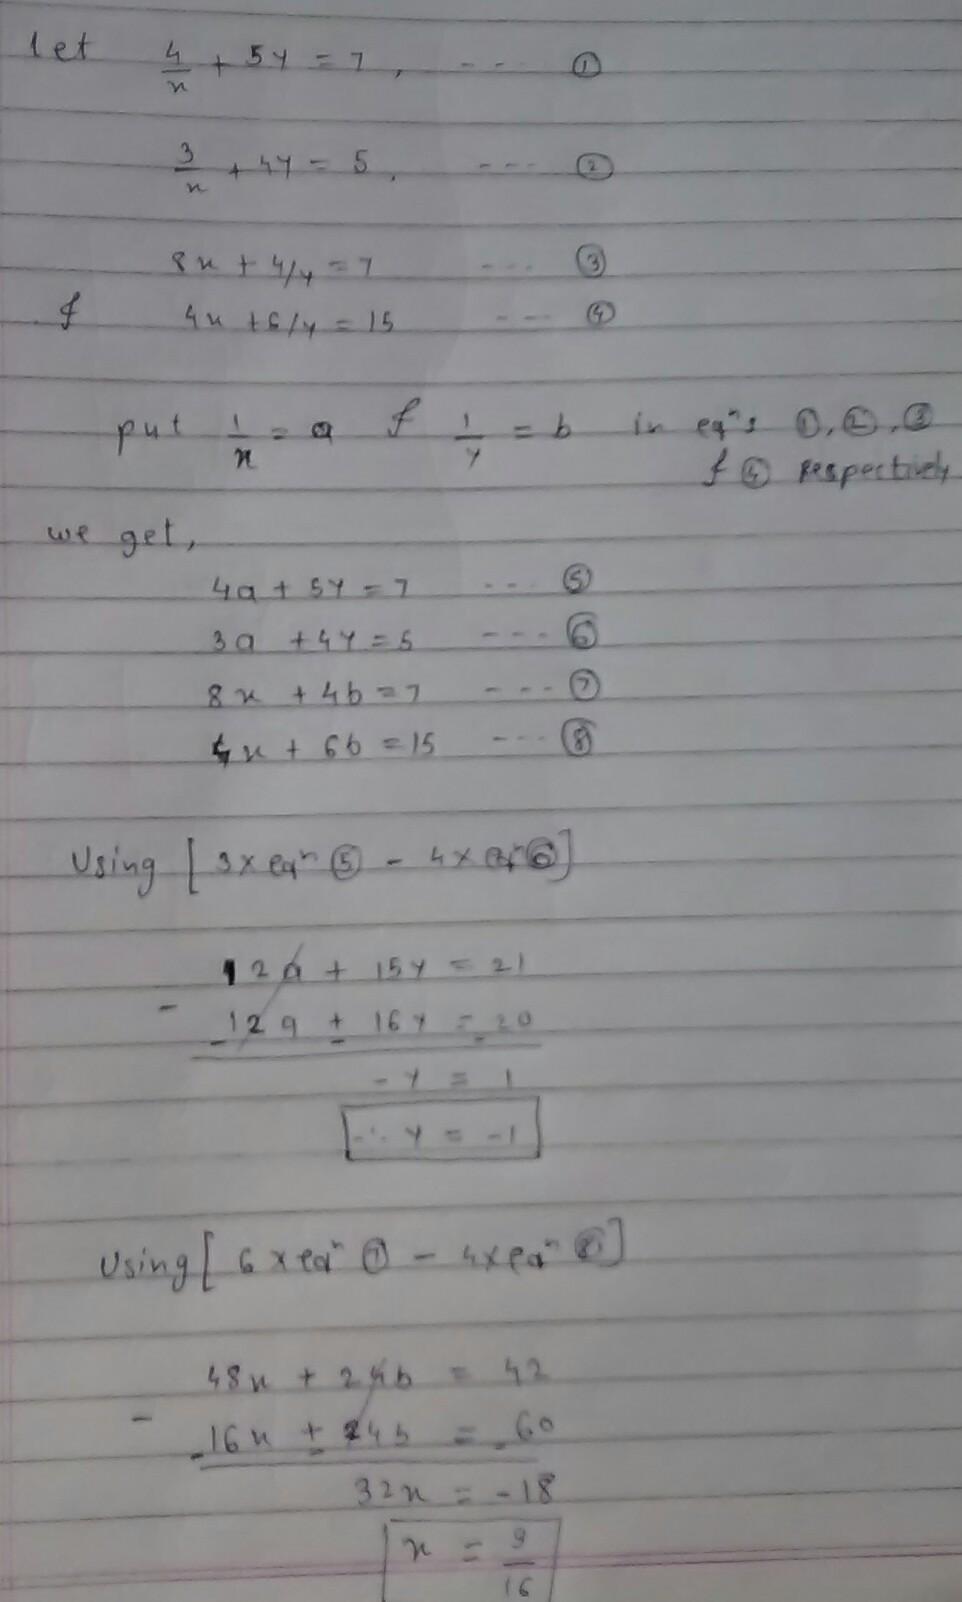 Solve For X And Y 4x5y7 3x4y58x4y74x6y15 Brainlyin